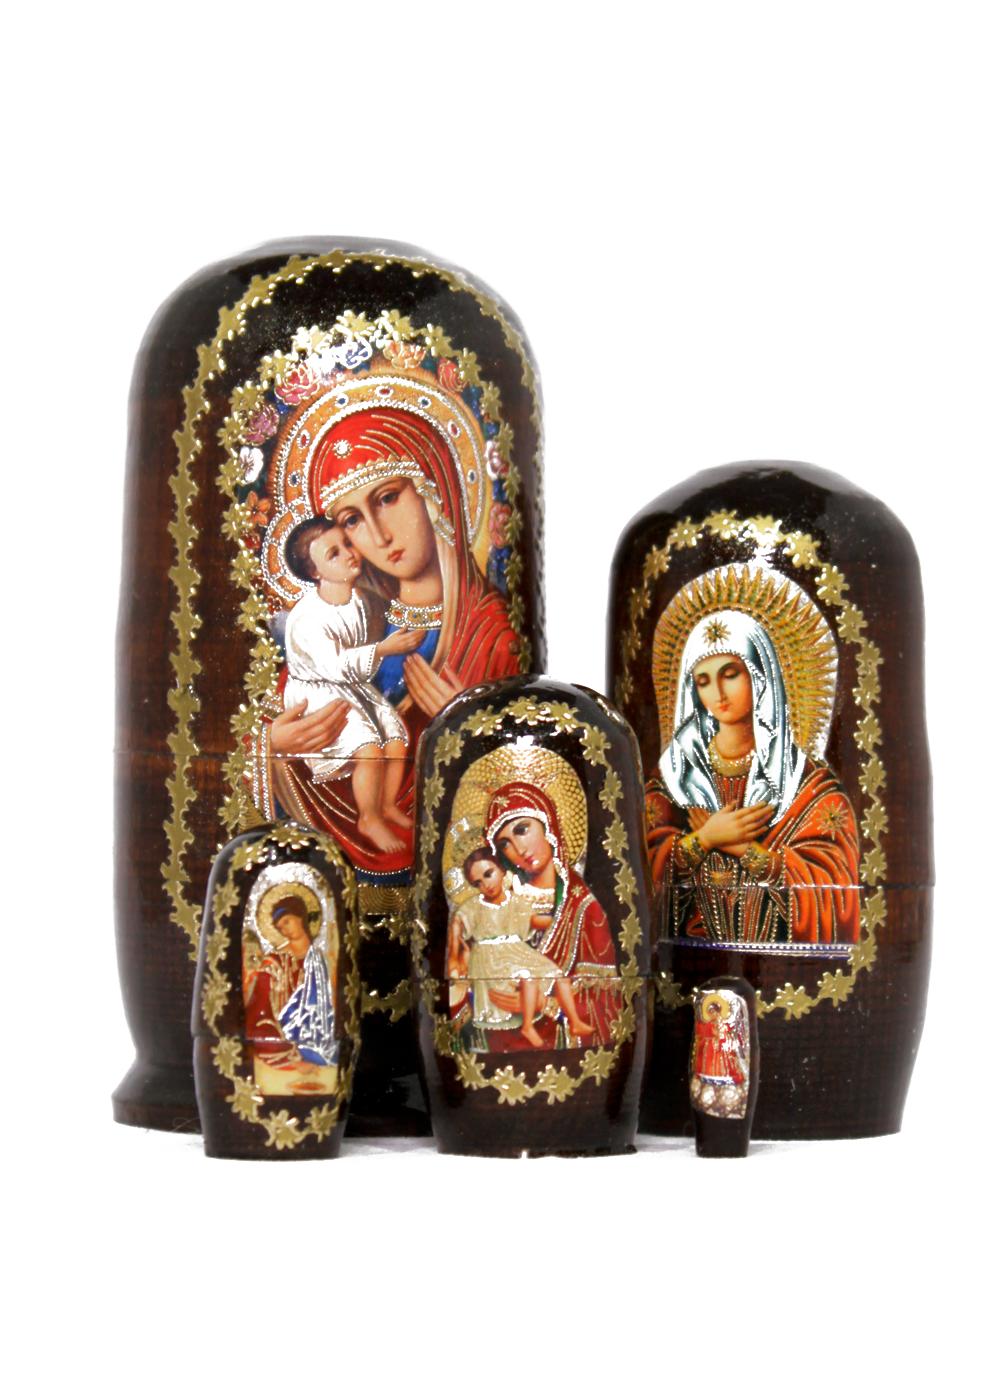 Russian saint icons matryoshka set with five nesting dolls